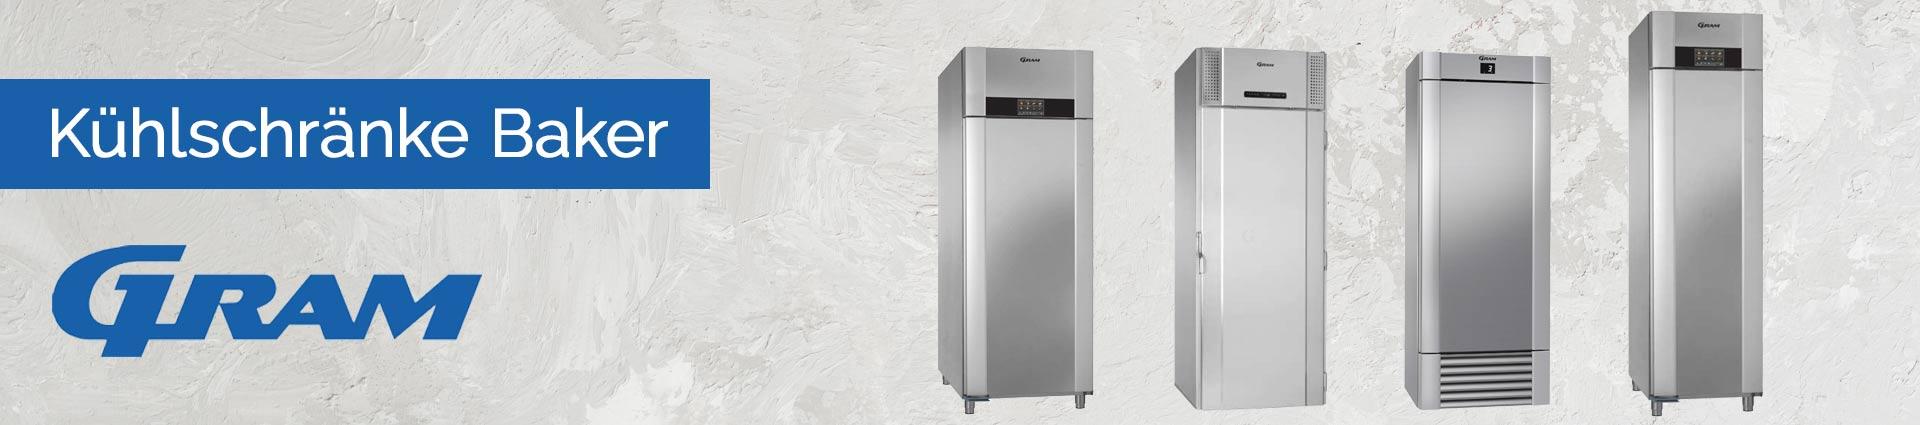 GRAM Kühlschränke Baker Banner